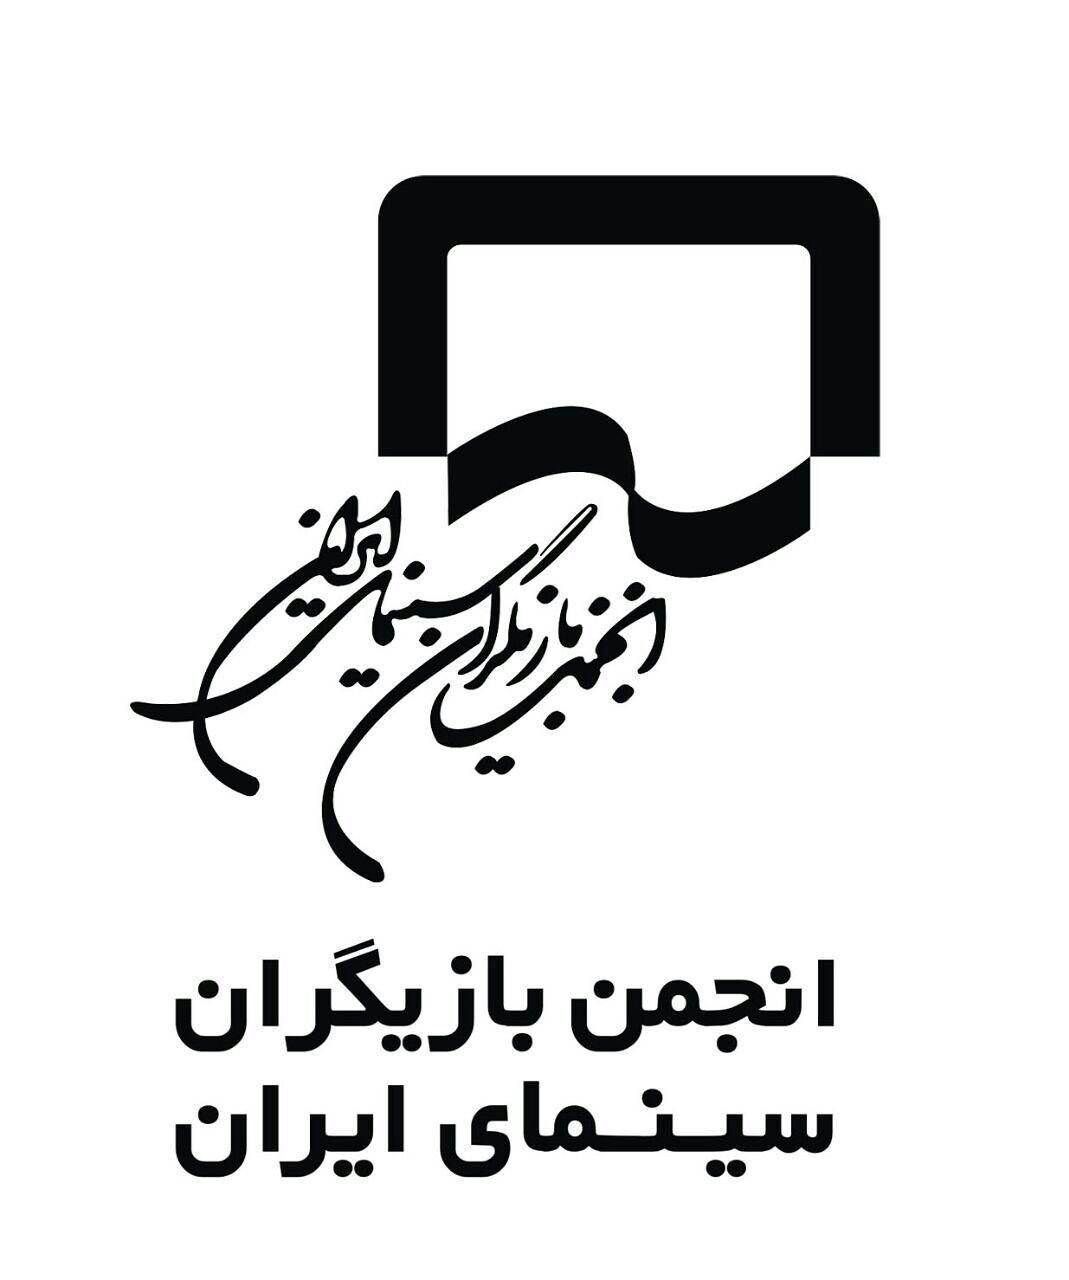 پيام تبريك انجمن بازيگران به برگزيده گان جشن سينما